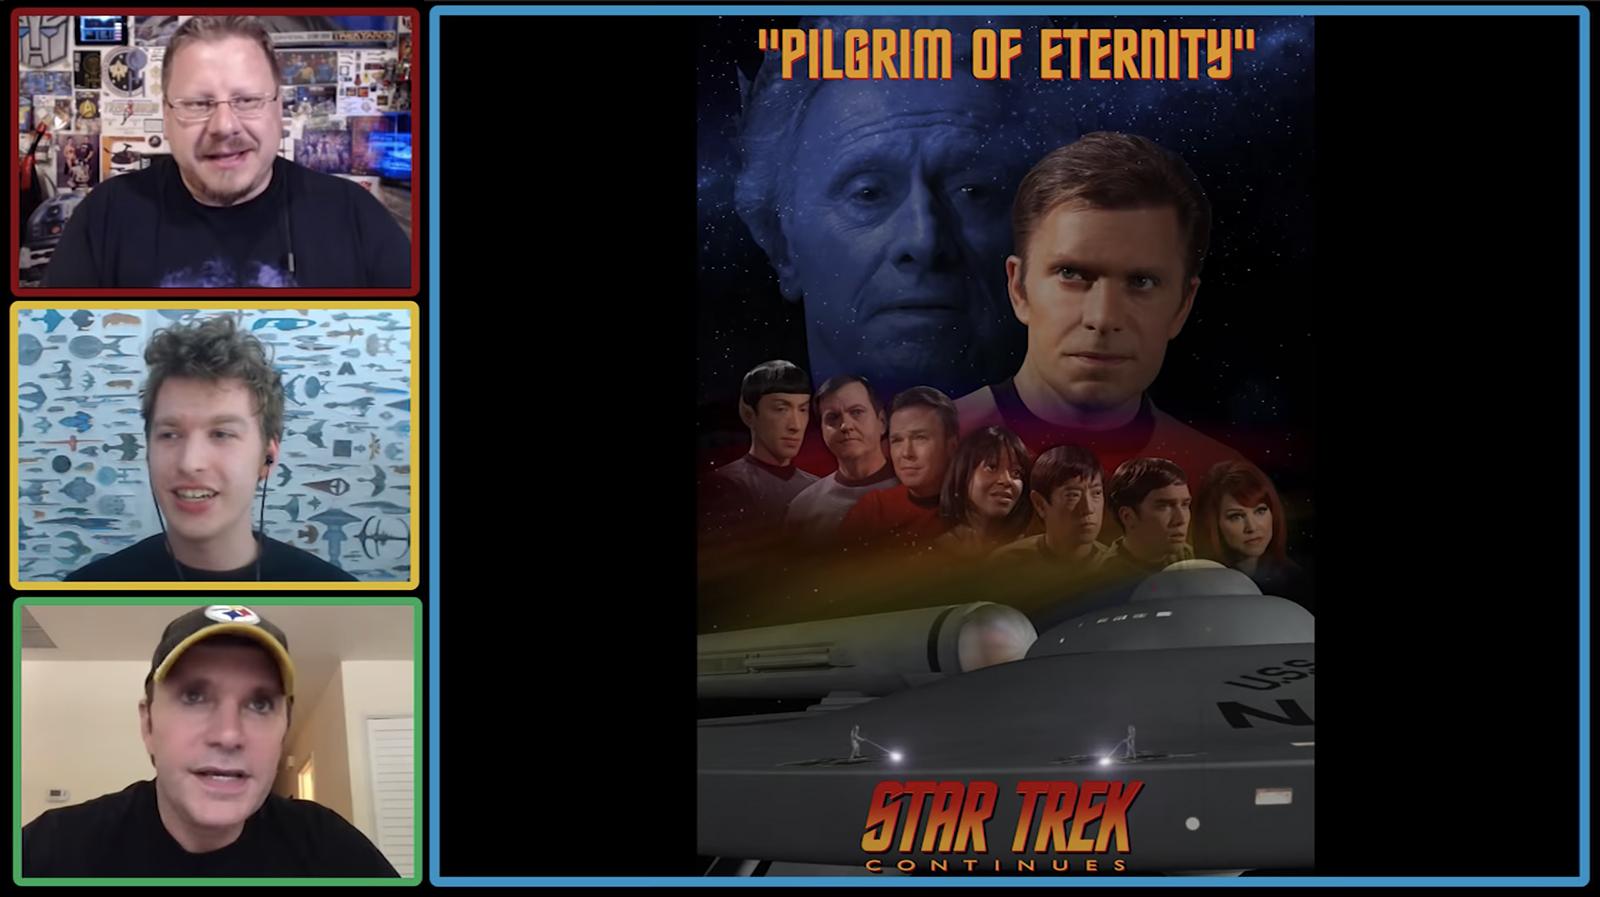 star trek continues episode 6 download